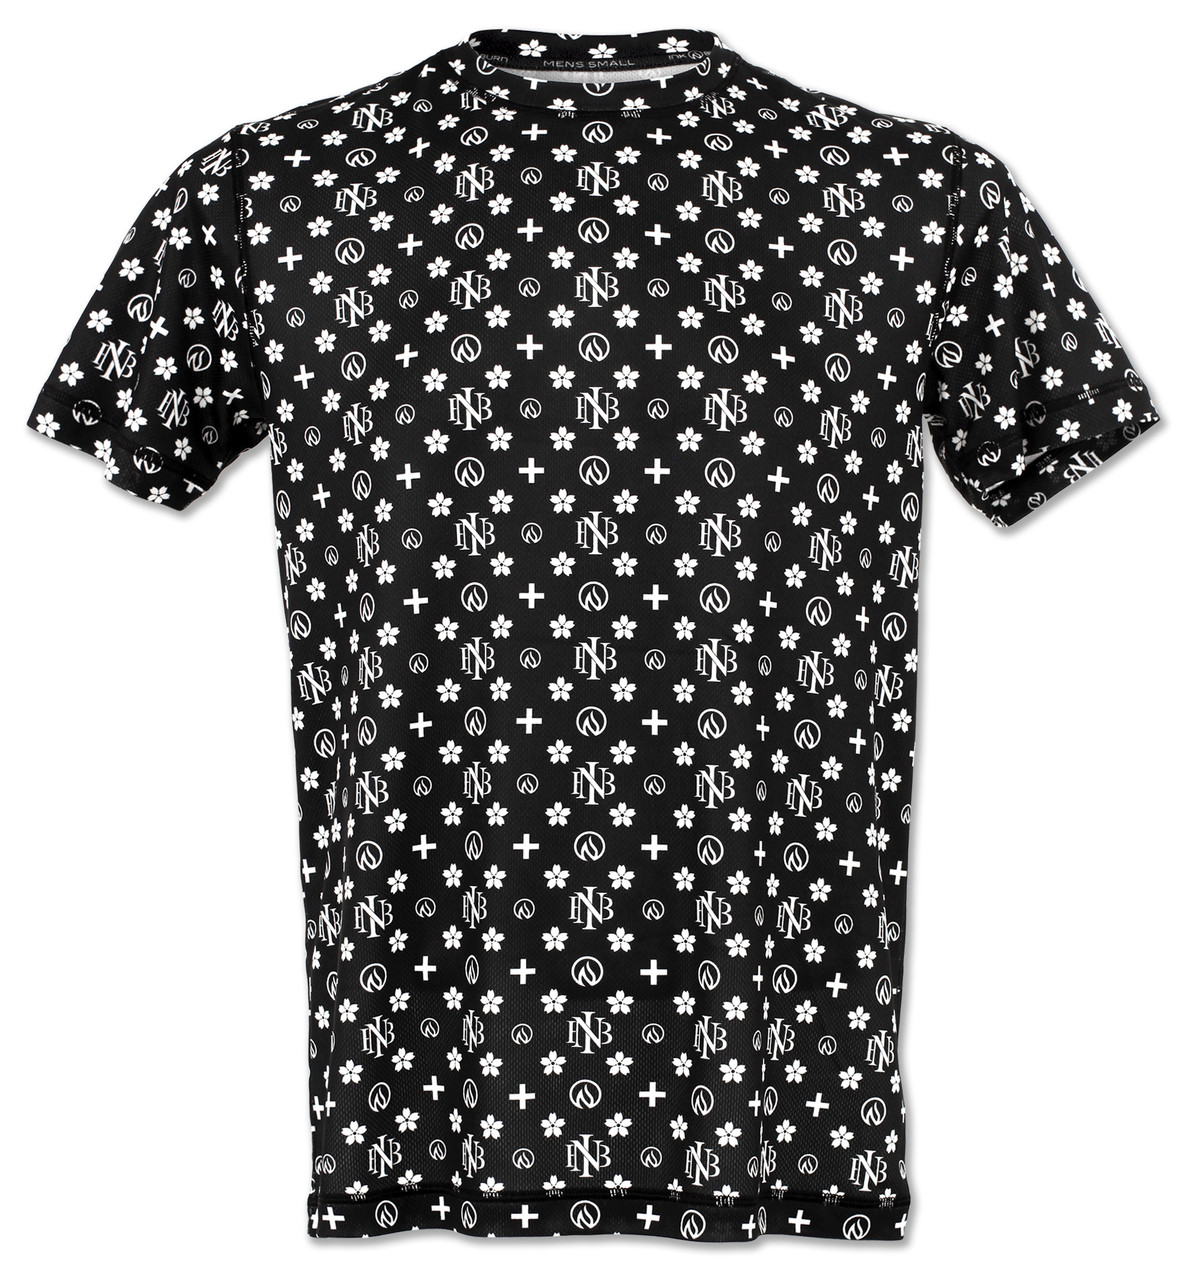 INKnBURN Men's Club INB Monogram Tech Shirt Front